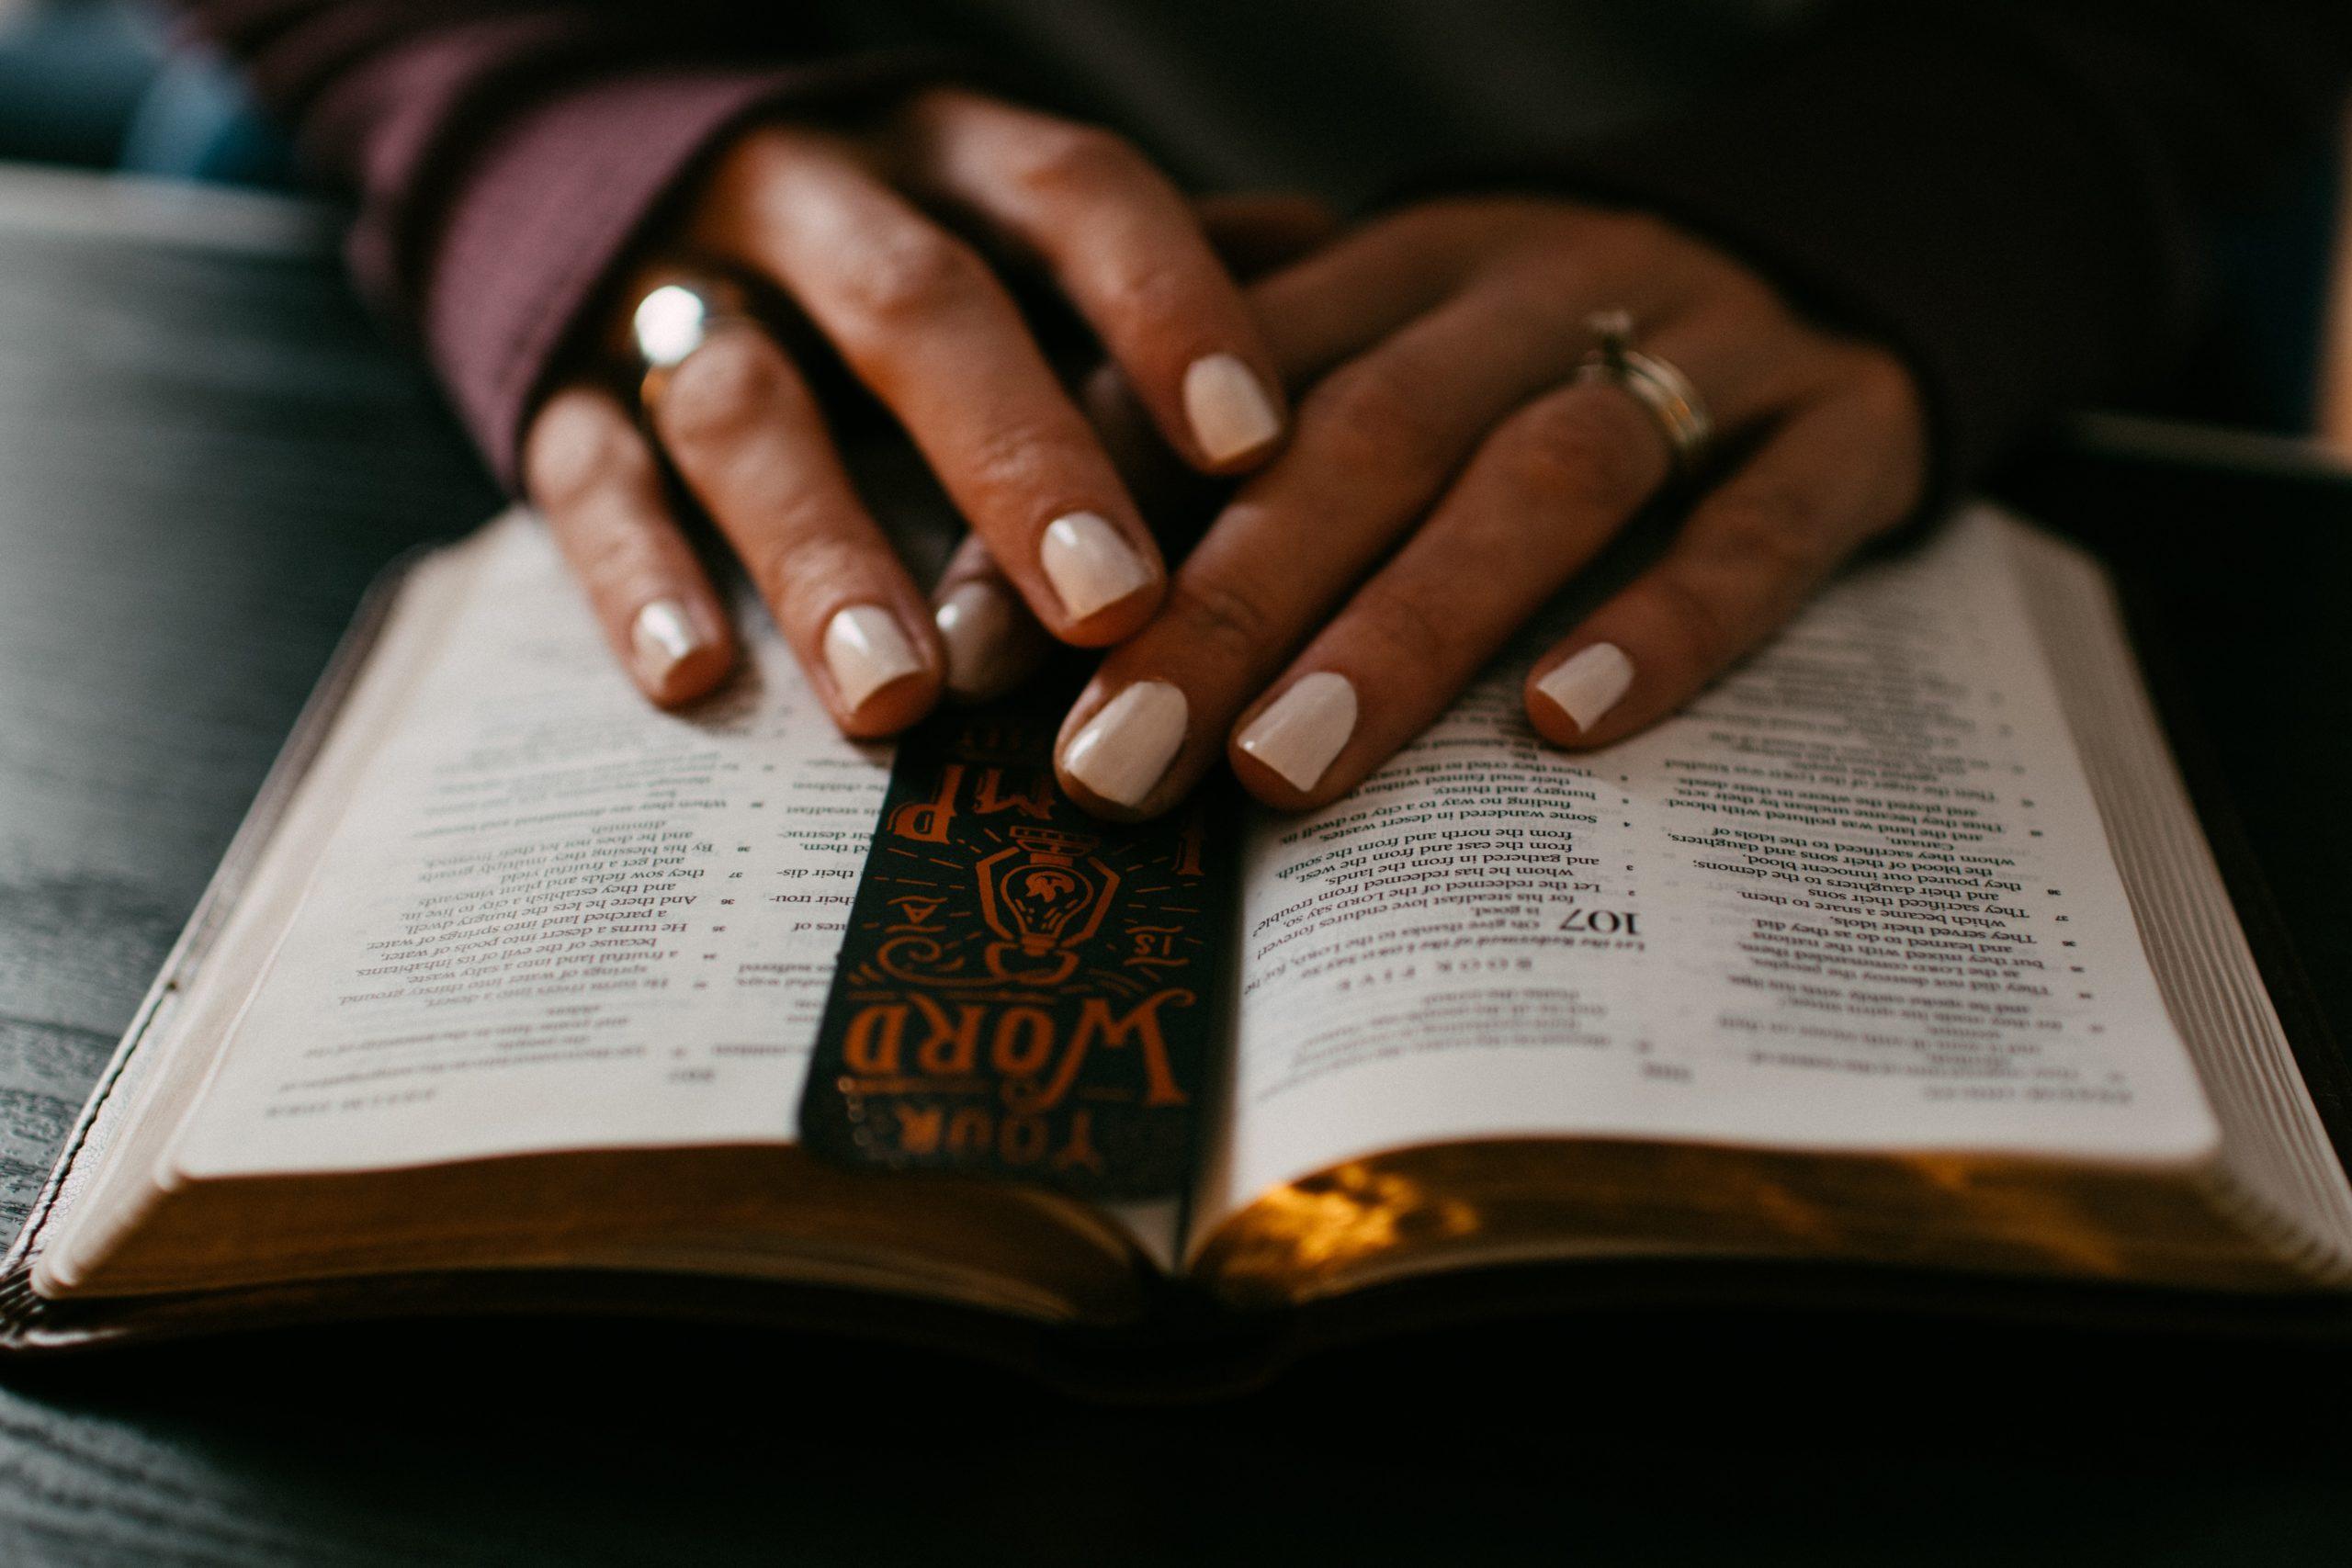 Reflections: I Corinthians 15:10